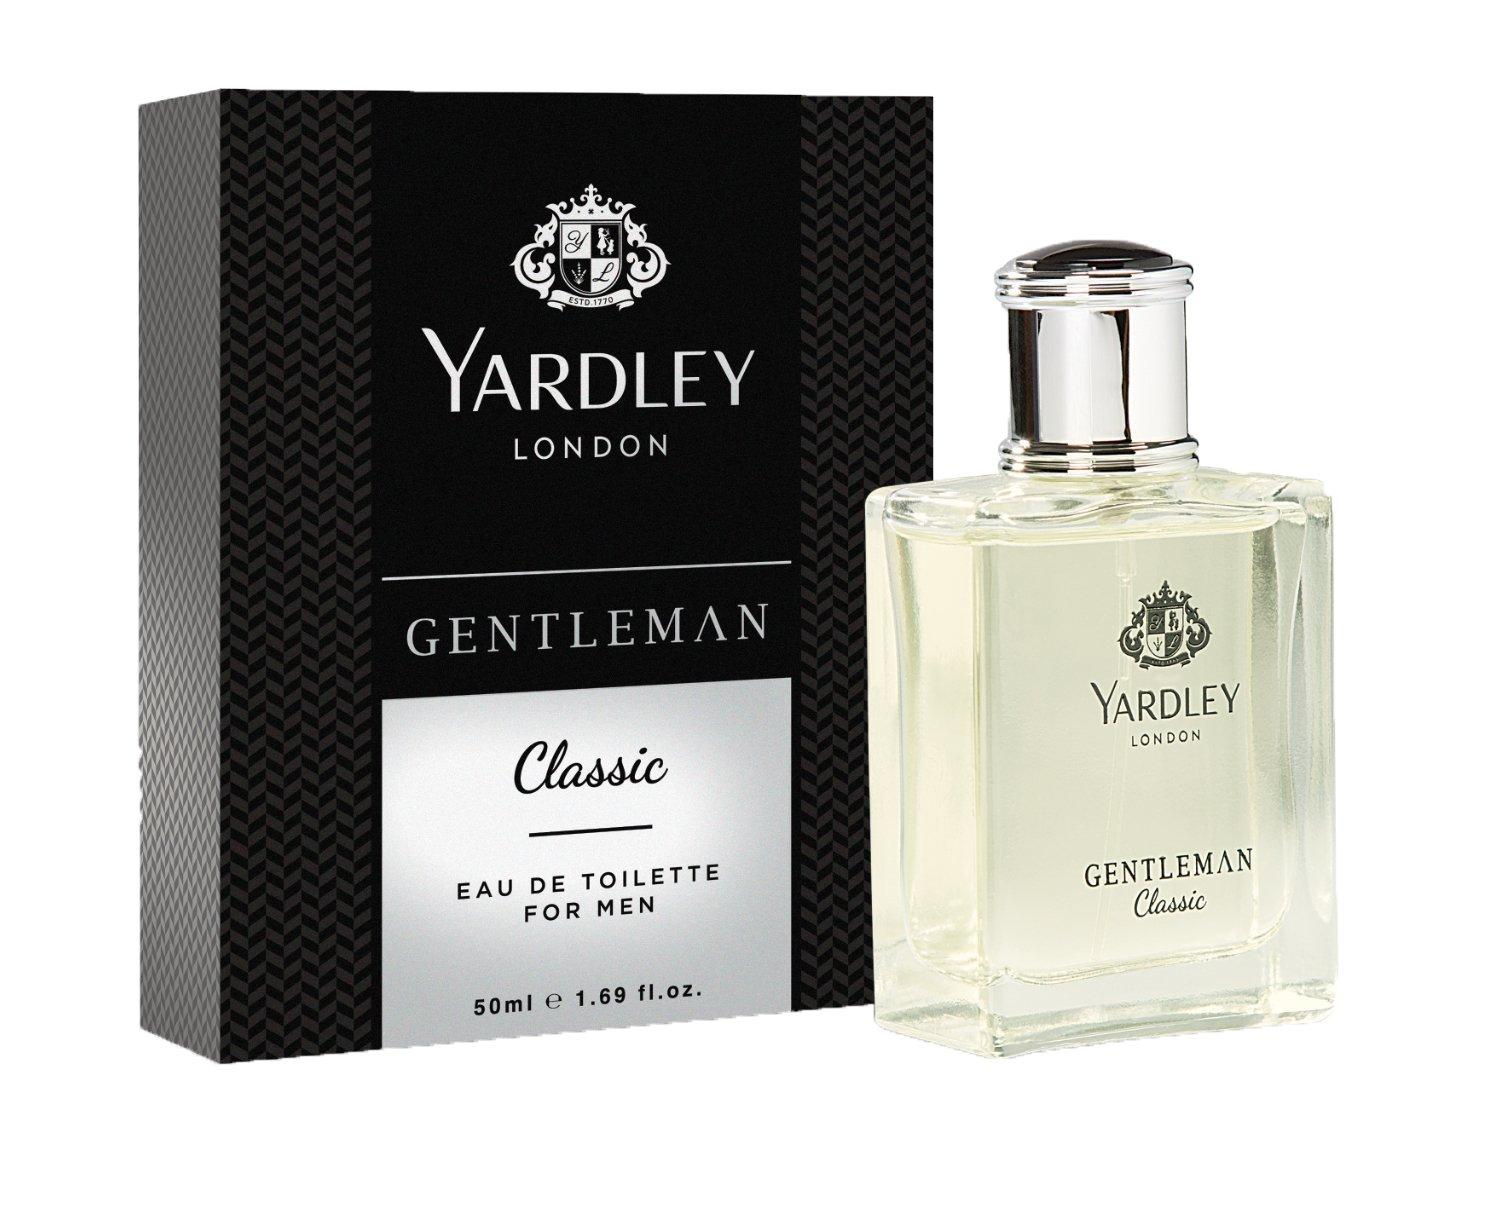 Yardley London - Gentleman Classic Eau de Toilette for Men, 50ml